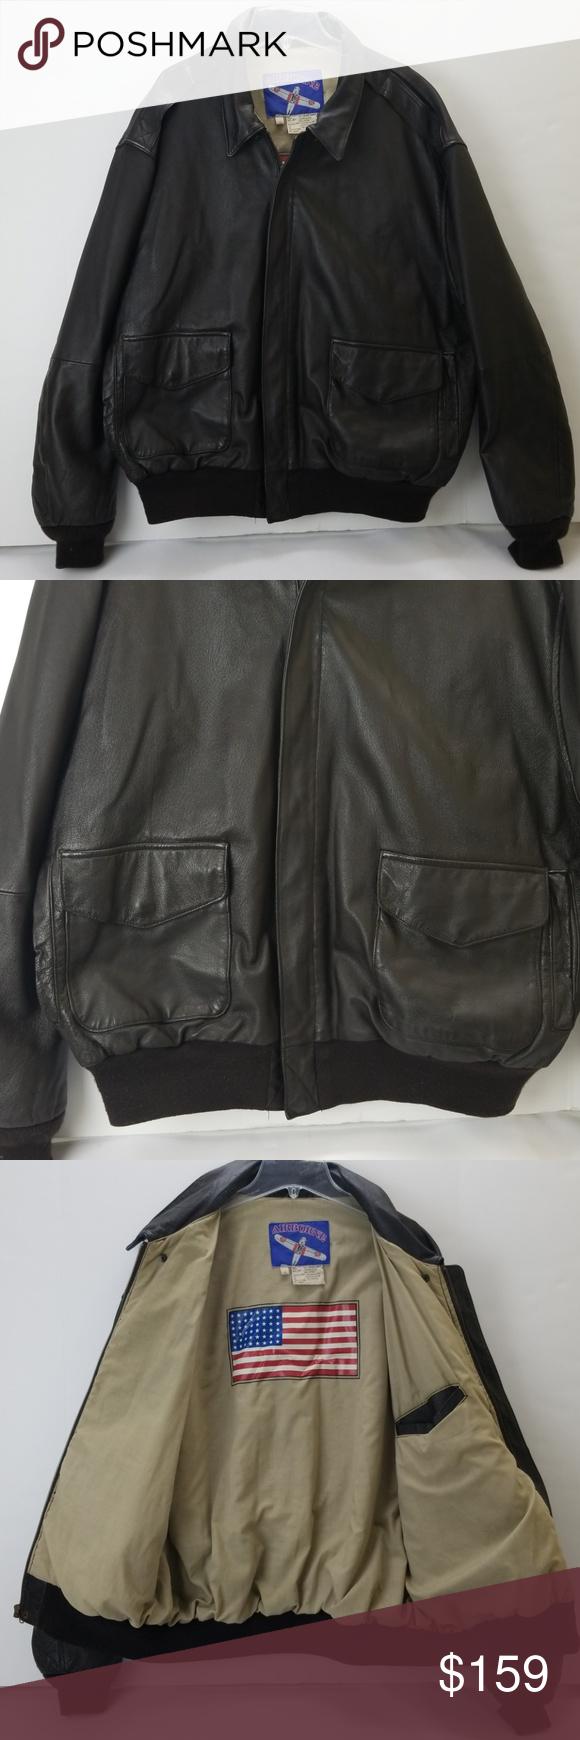 Vintage Airborne Men S Leather Jacket Leather Jacket Men S Leather Jacket Leather Men [ 1740 x 580 Pixel ]